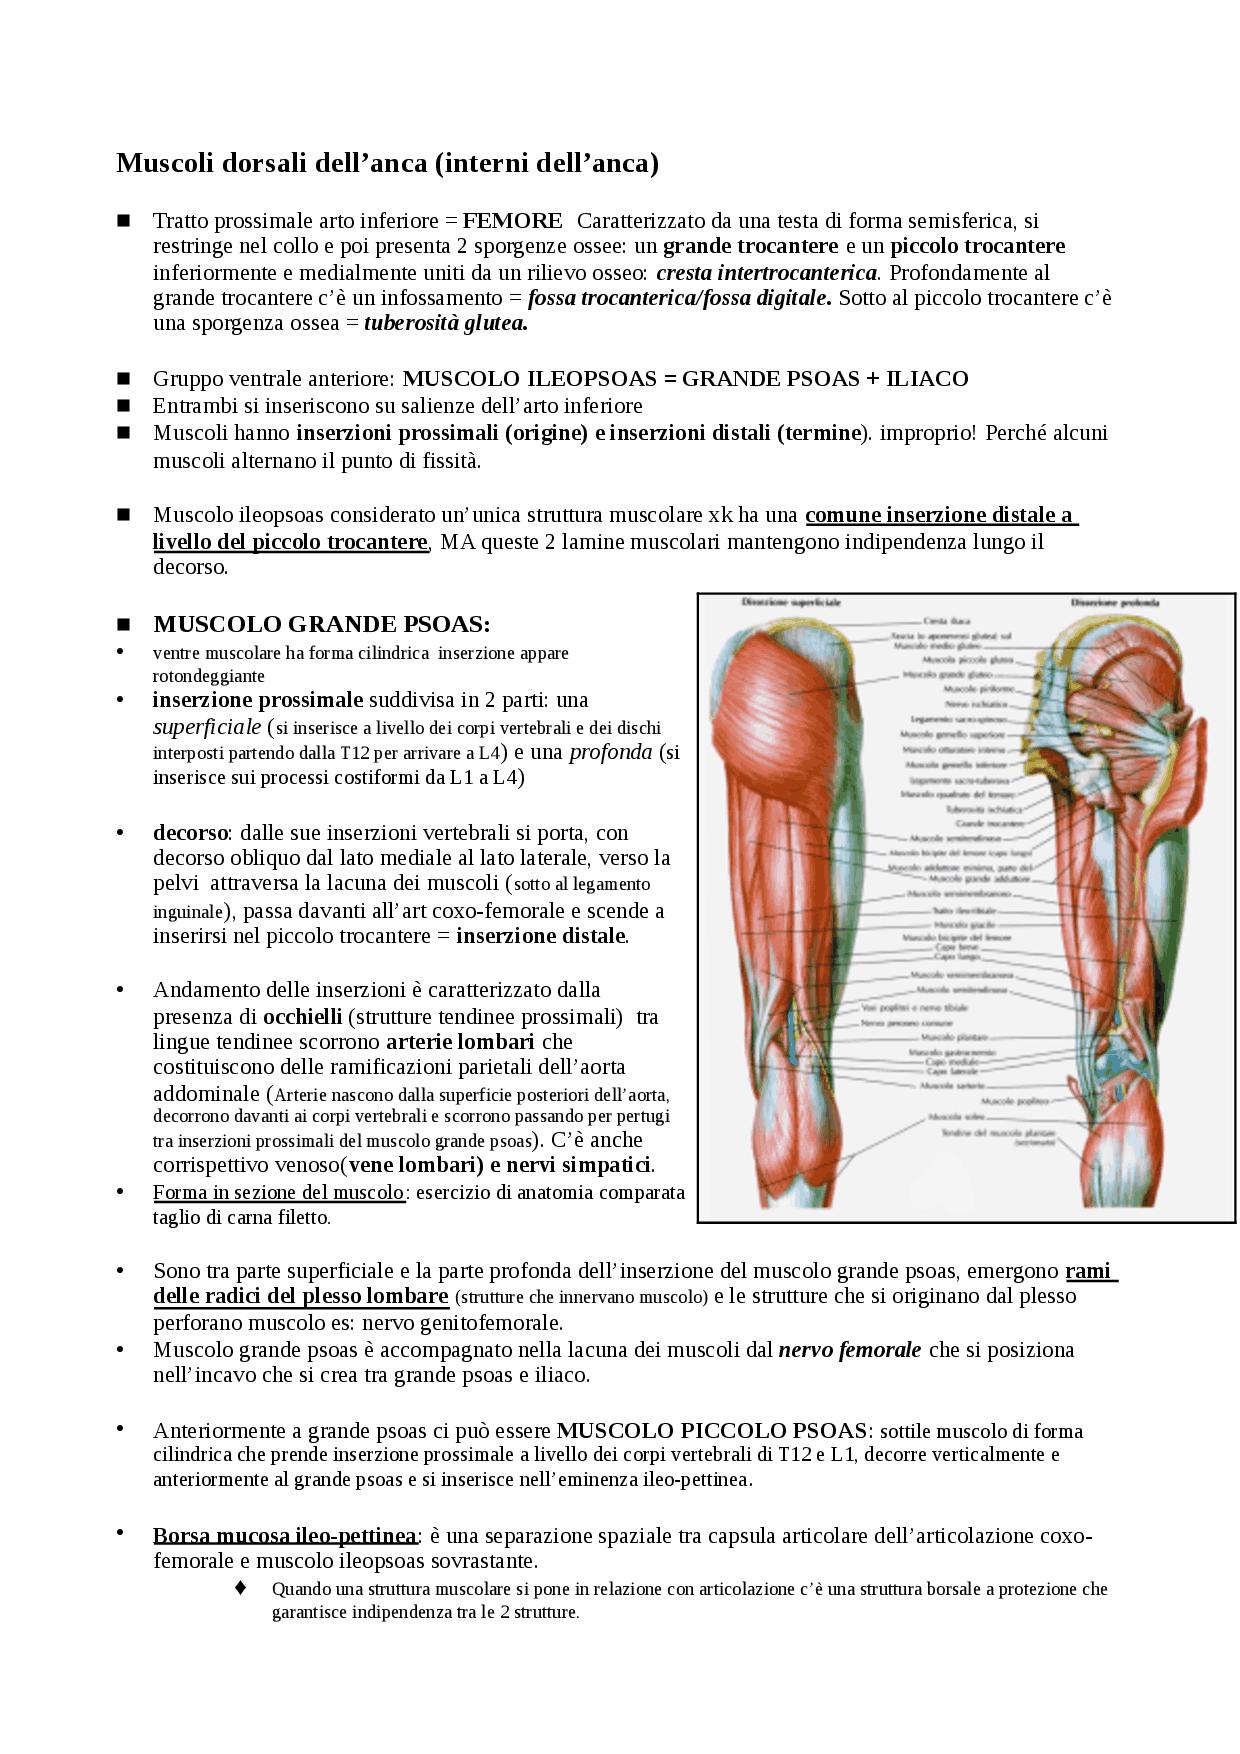 Fein Zerebralen Hemisphären Anatomie Fotos - Anatomie Ideen ...